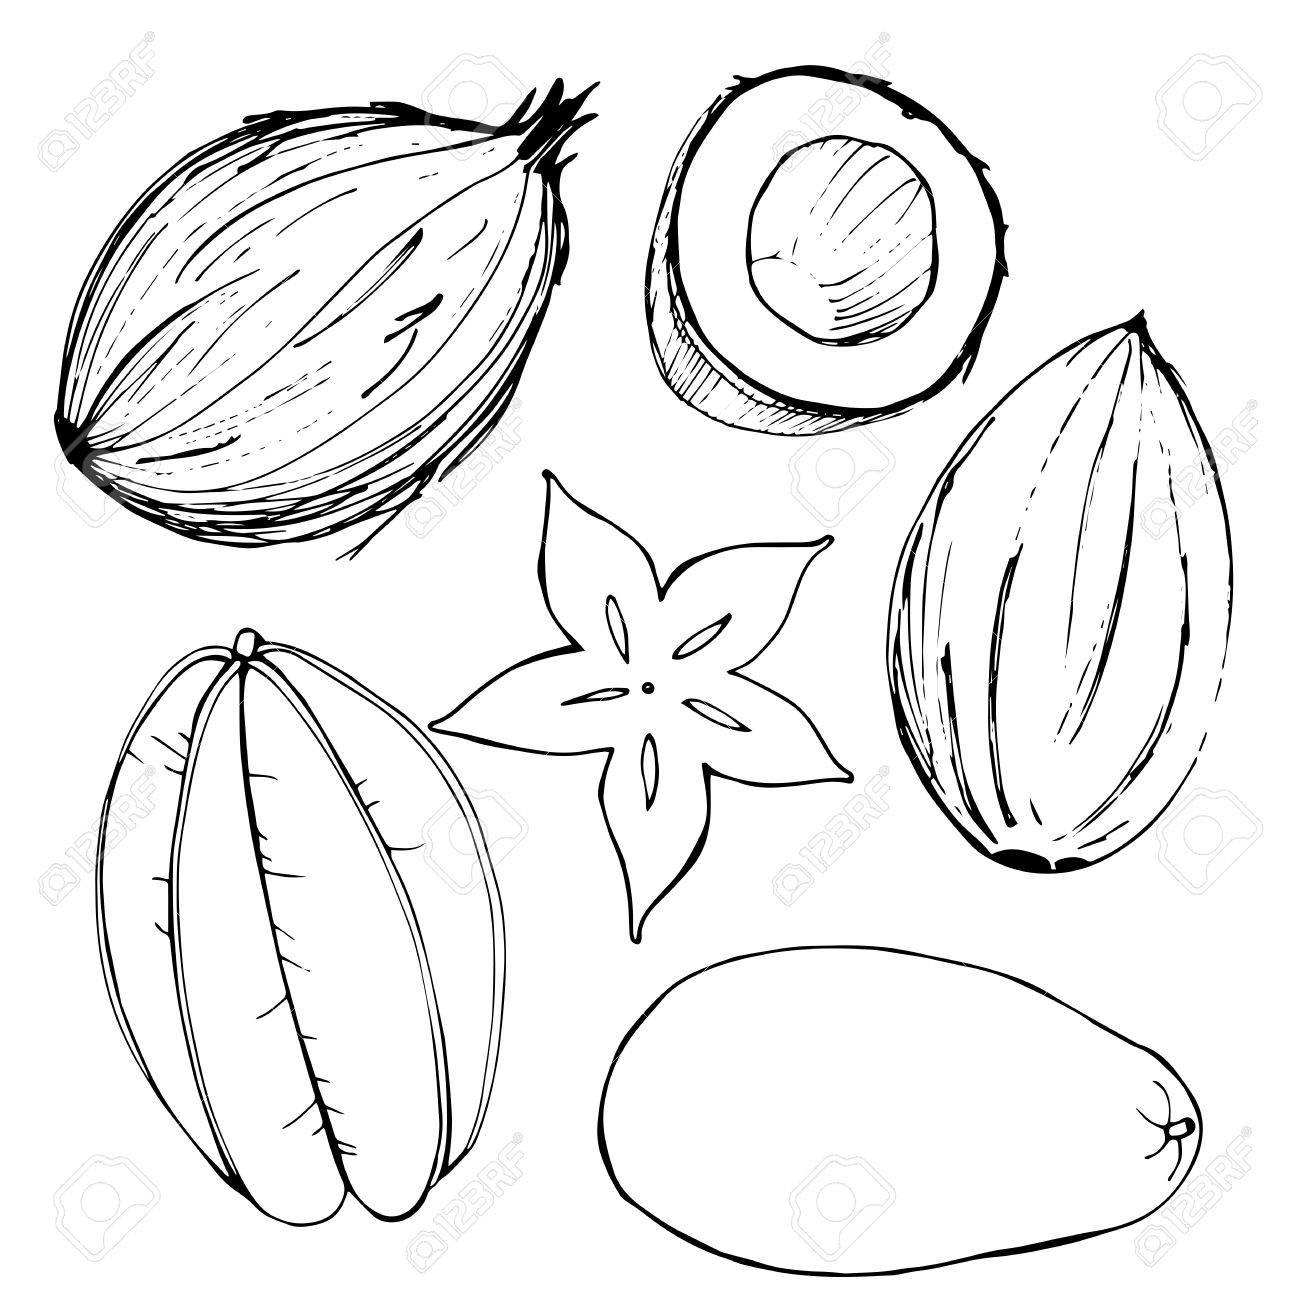 1300x1300 Hand Drawn Fruits. Coconut, Mango, Carambola. Vector Illustration